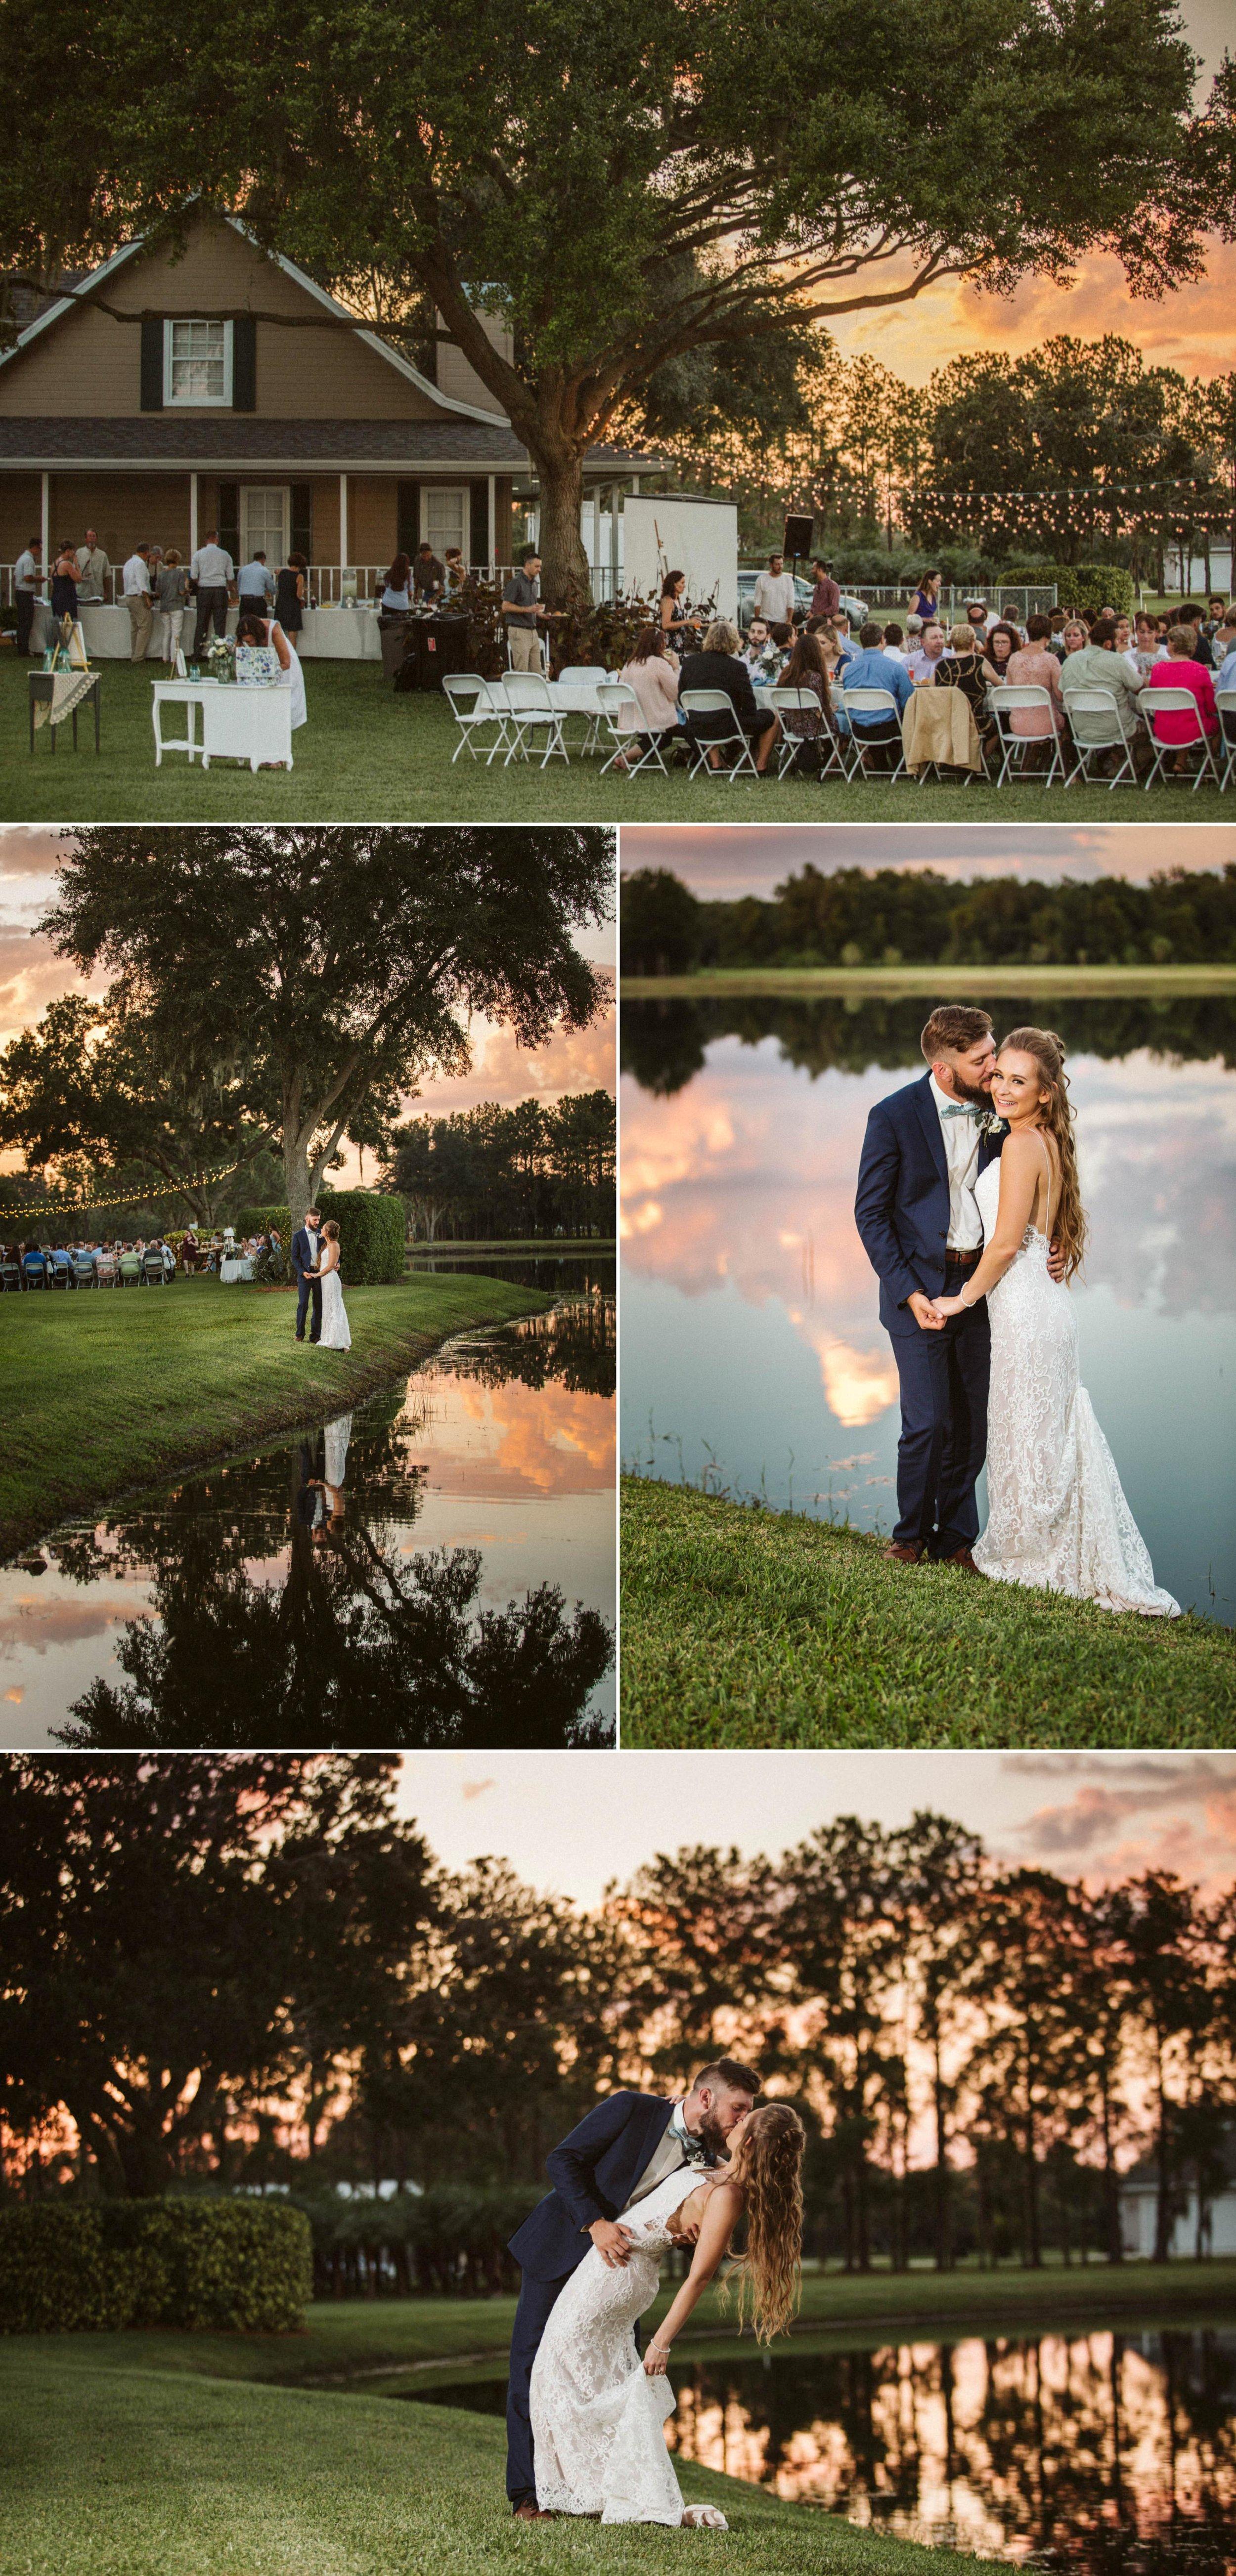 Romantic Floral Outdoor Field Chapel Wedding- Sarasota Florida- Courtney & Isaac24.jpg